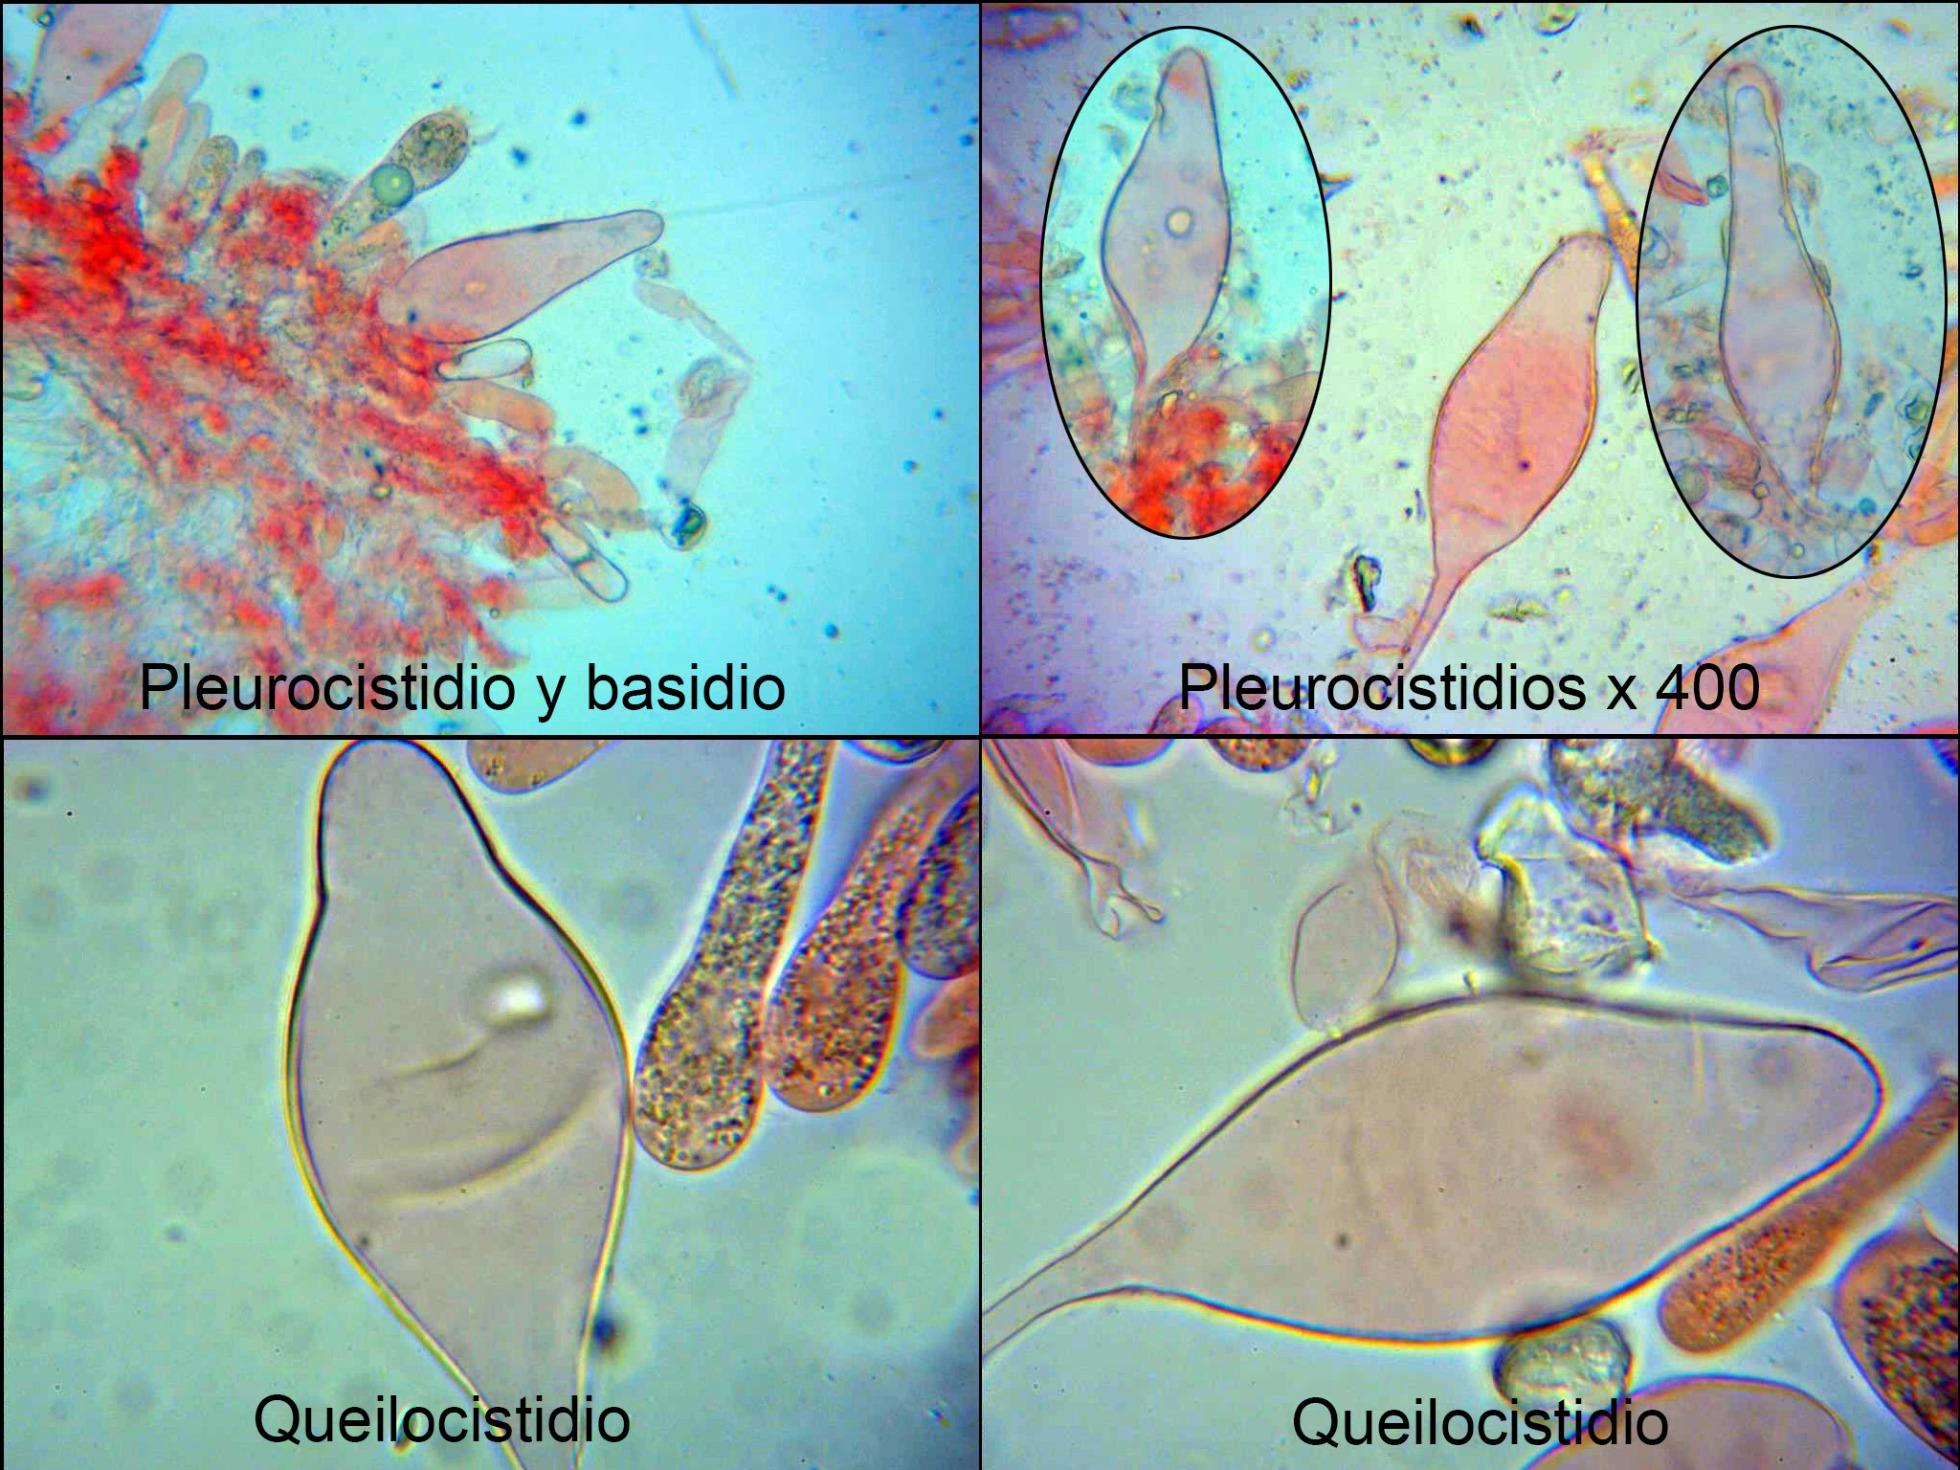 Oudemansiellaaffplatensis-canariicistidios_2021-09-01.jpg